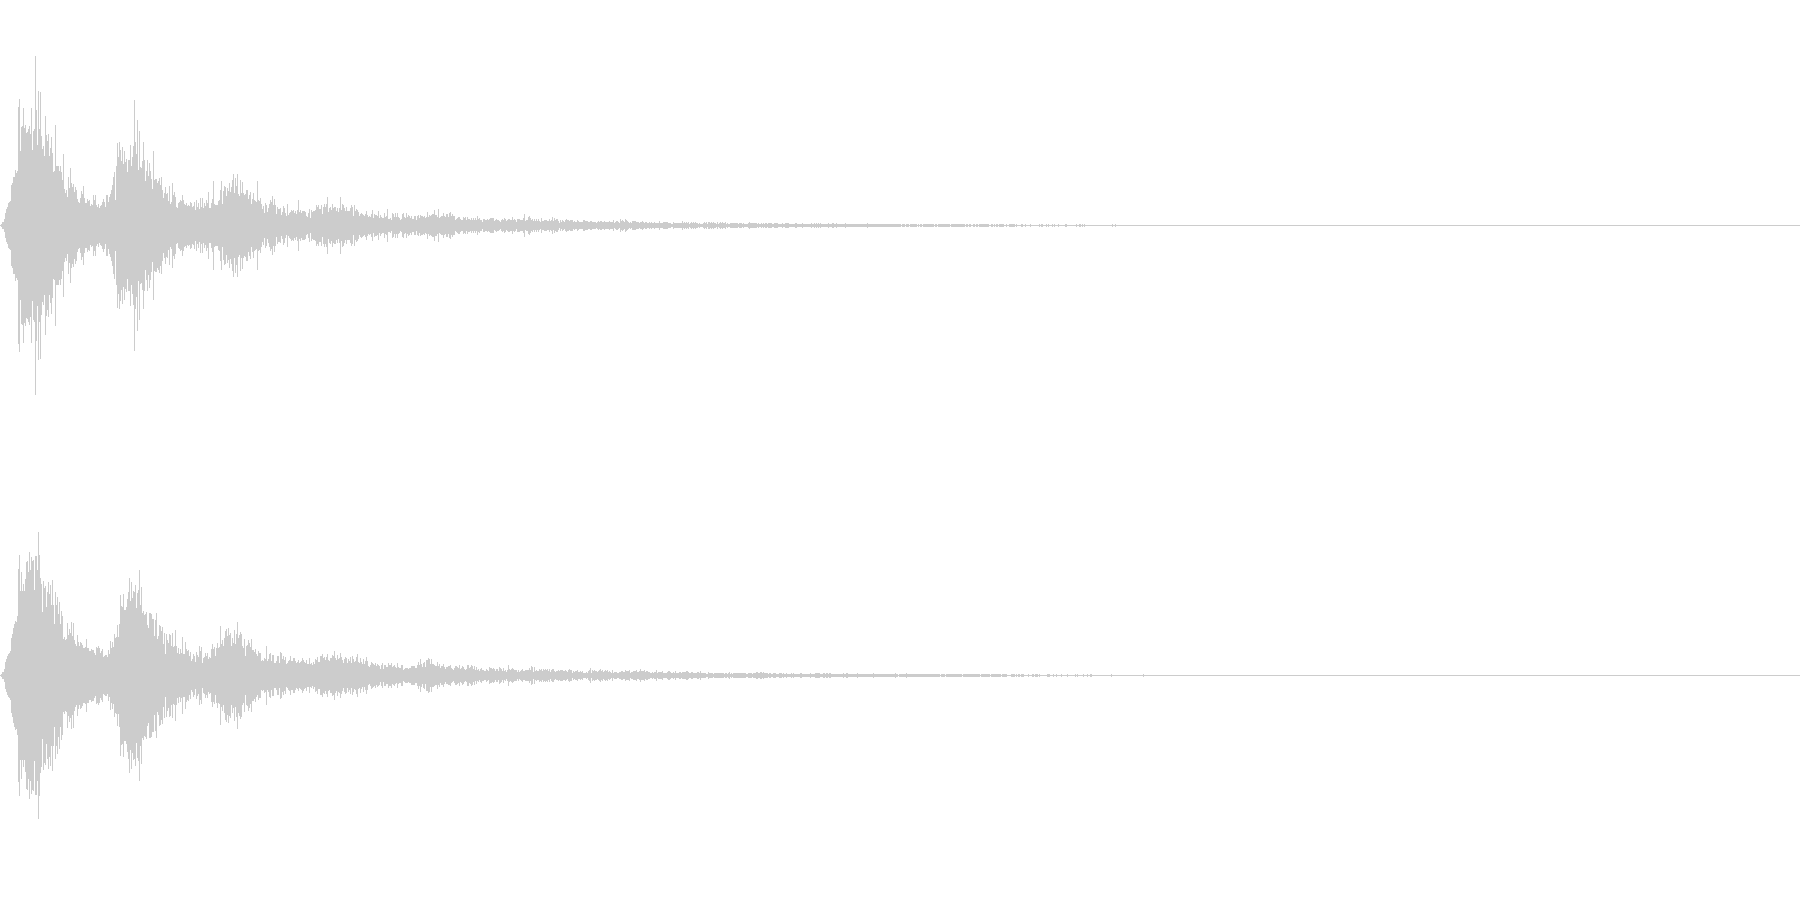 TVFX 風切り音 PR 目立たせSE1の未再生の波形